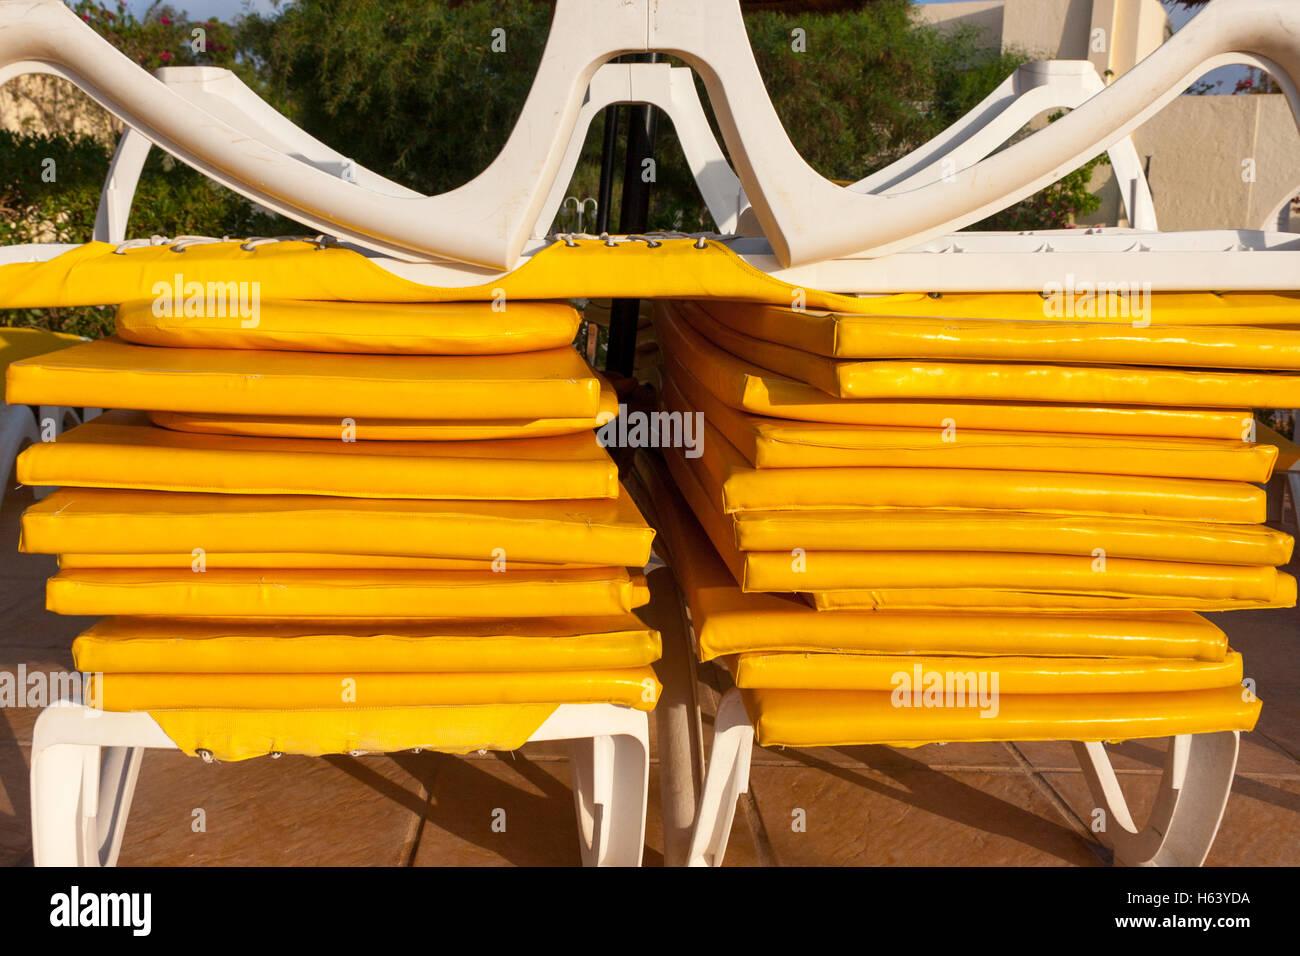 yellow sun bed mattresses - Stock Image